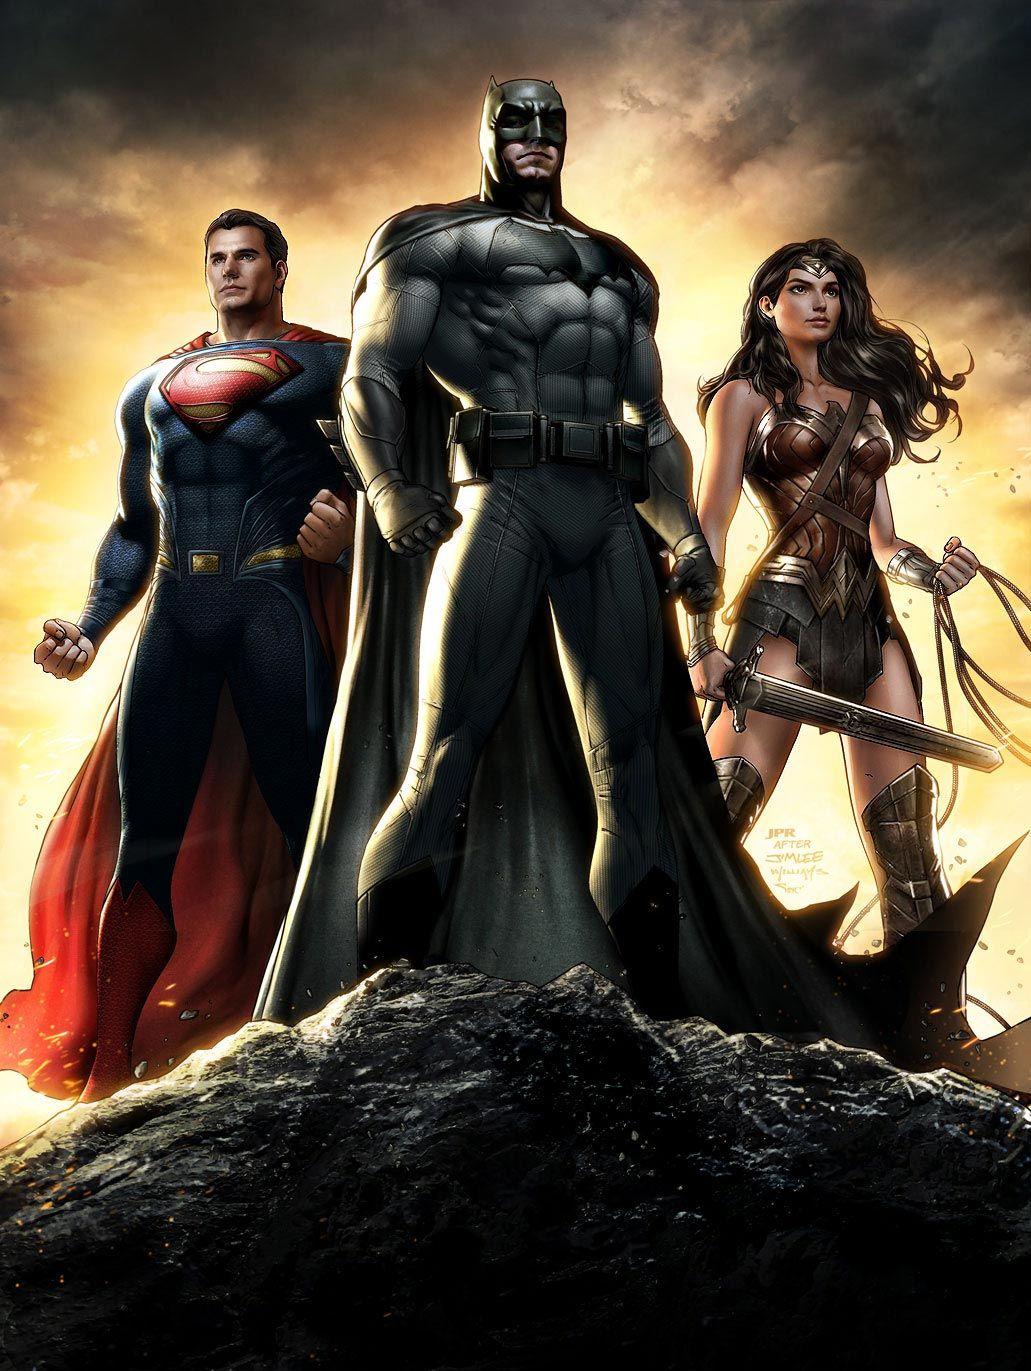 бэтмен против супермена картинки бэтмена отличный вариант